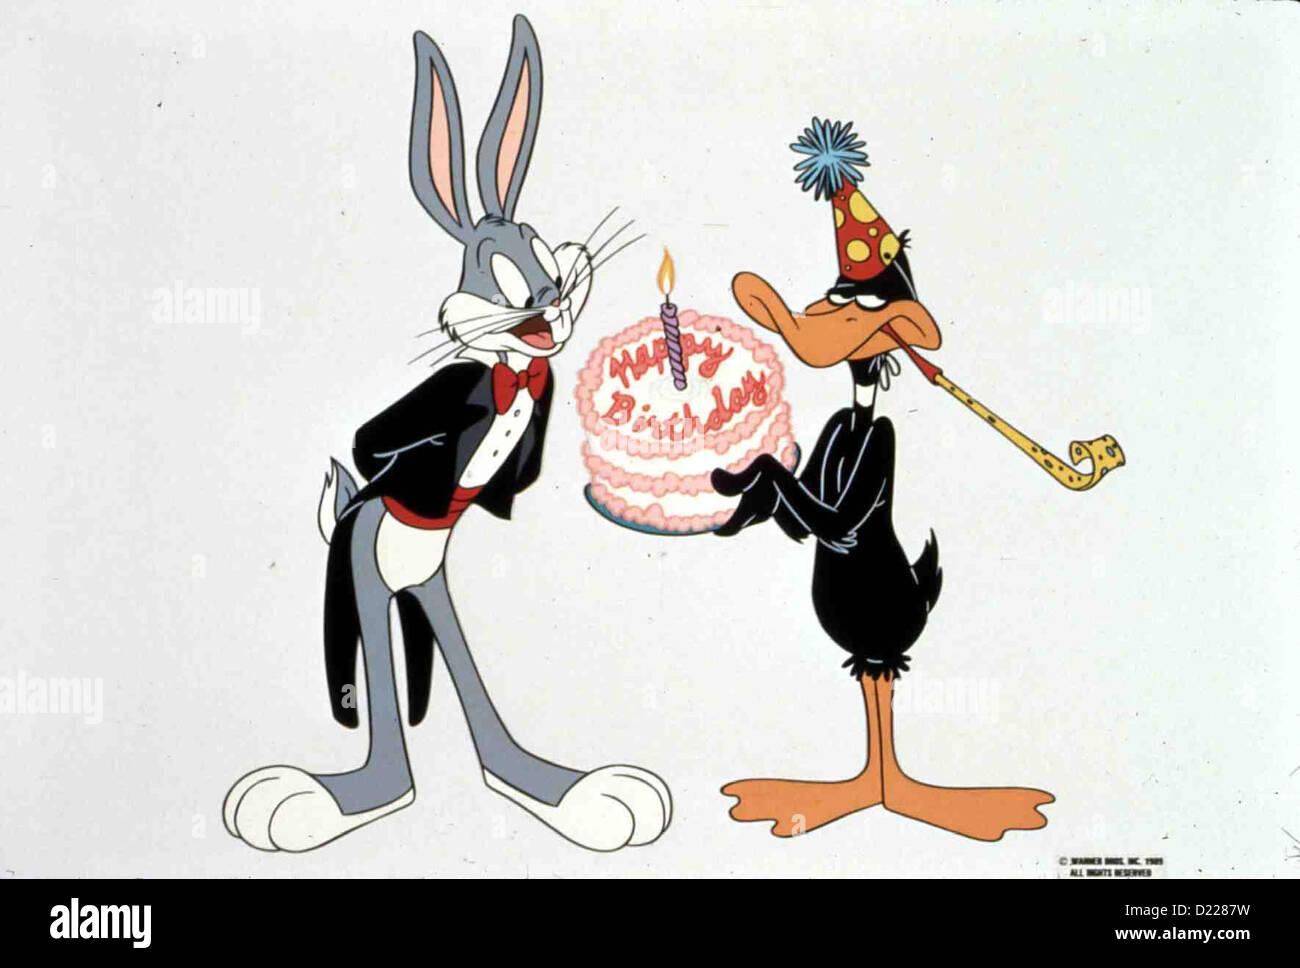 Happy Birthday Bugs Happy Birthday Bugs Bugs Bunny Und Daffy Duck Local Caption 1989 Warner Brothers Stock Photo Alamy